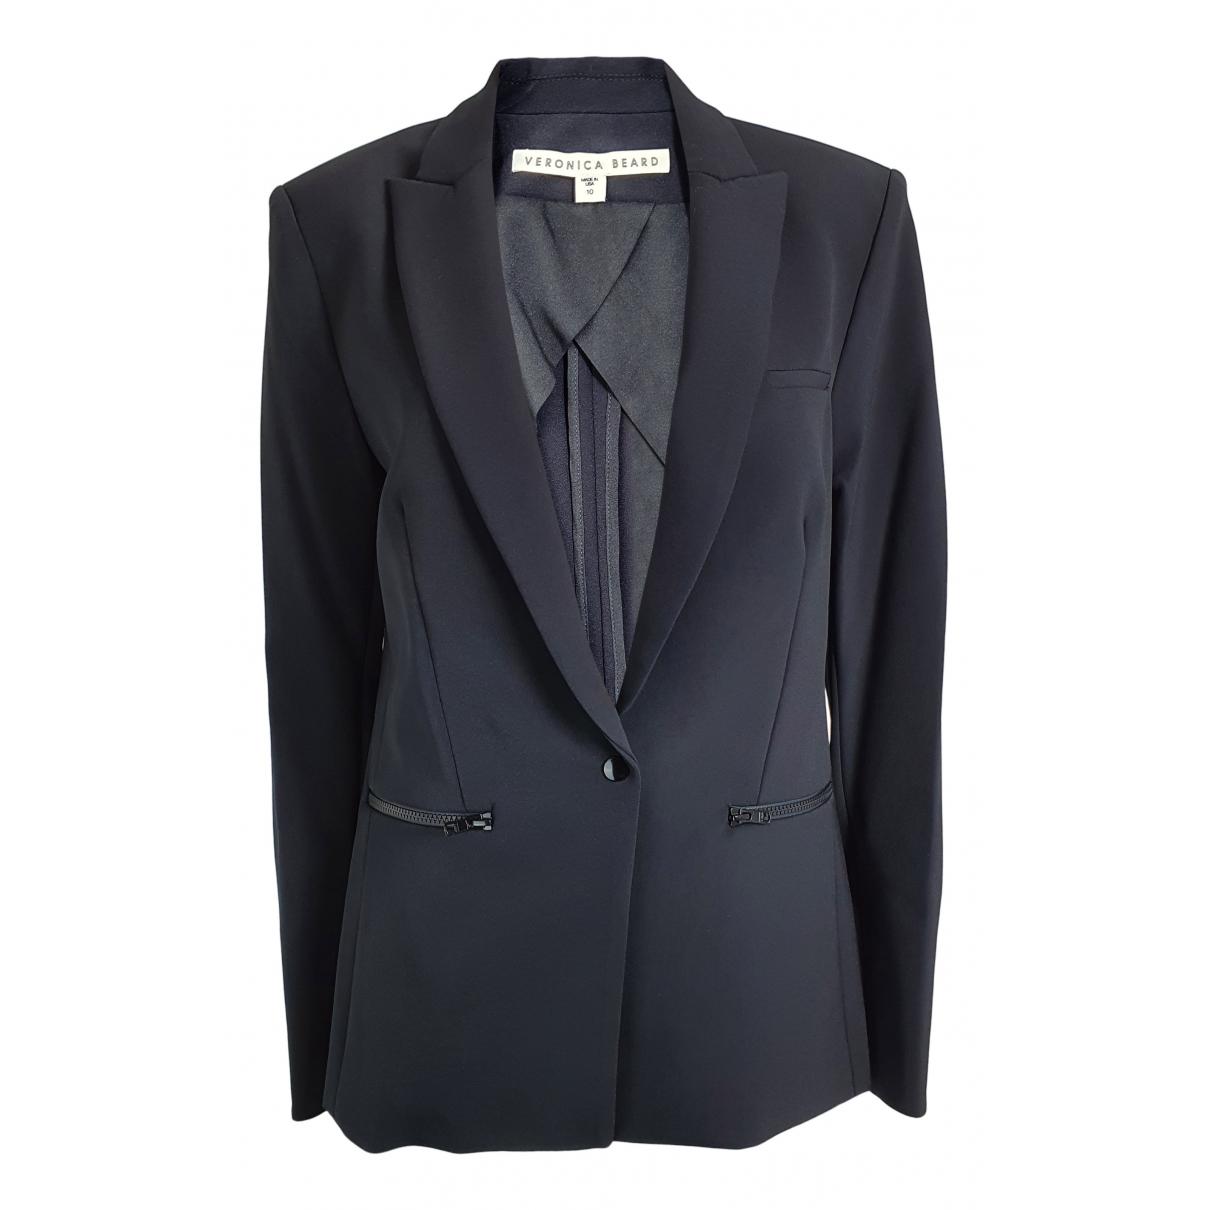 Veronica Beard \N Black jacket for Women 10 US